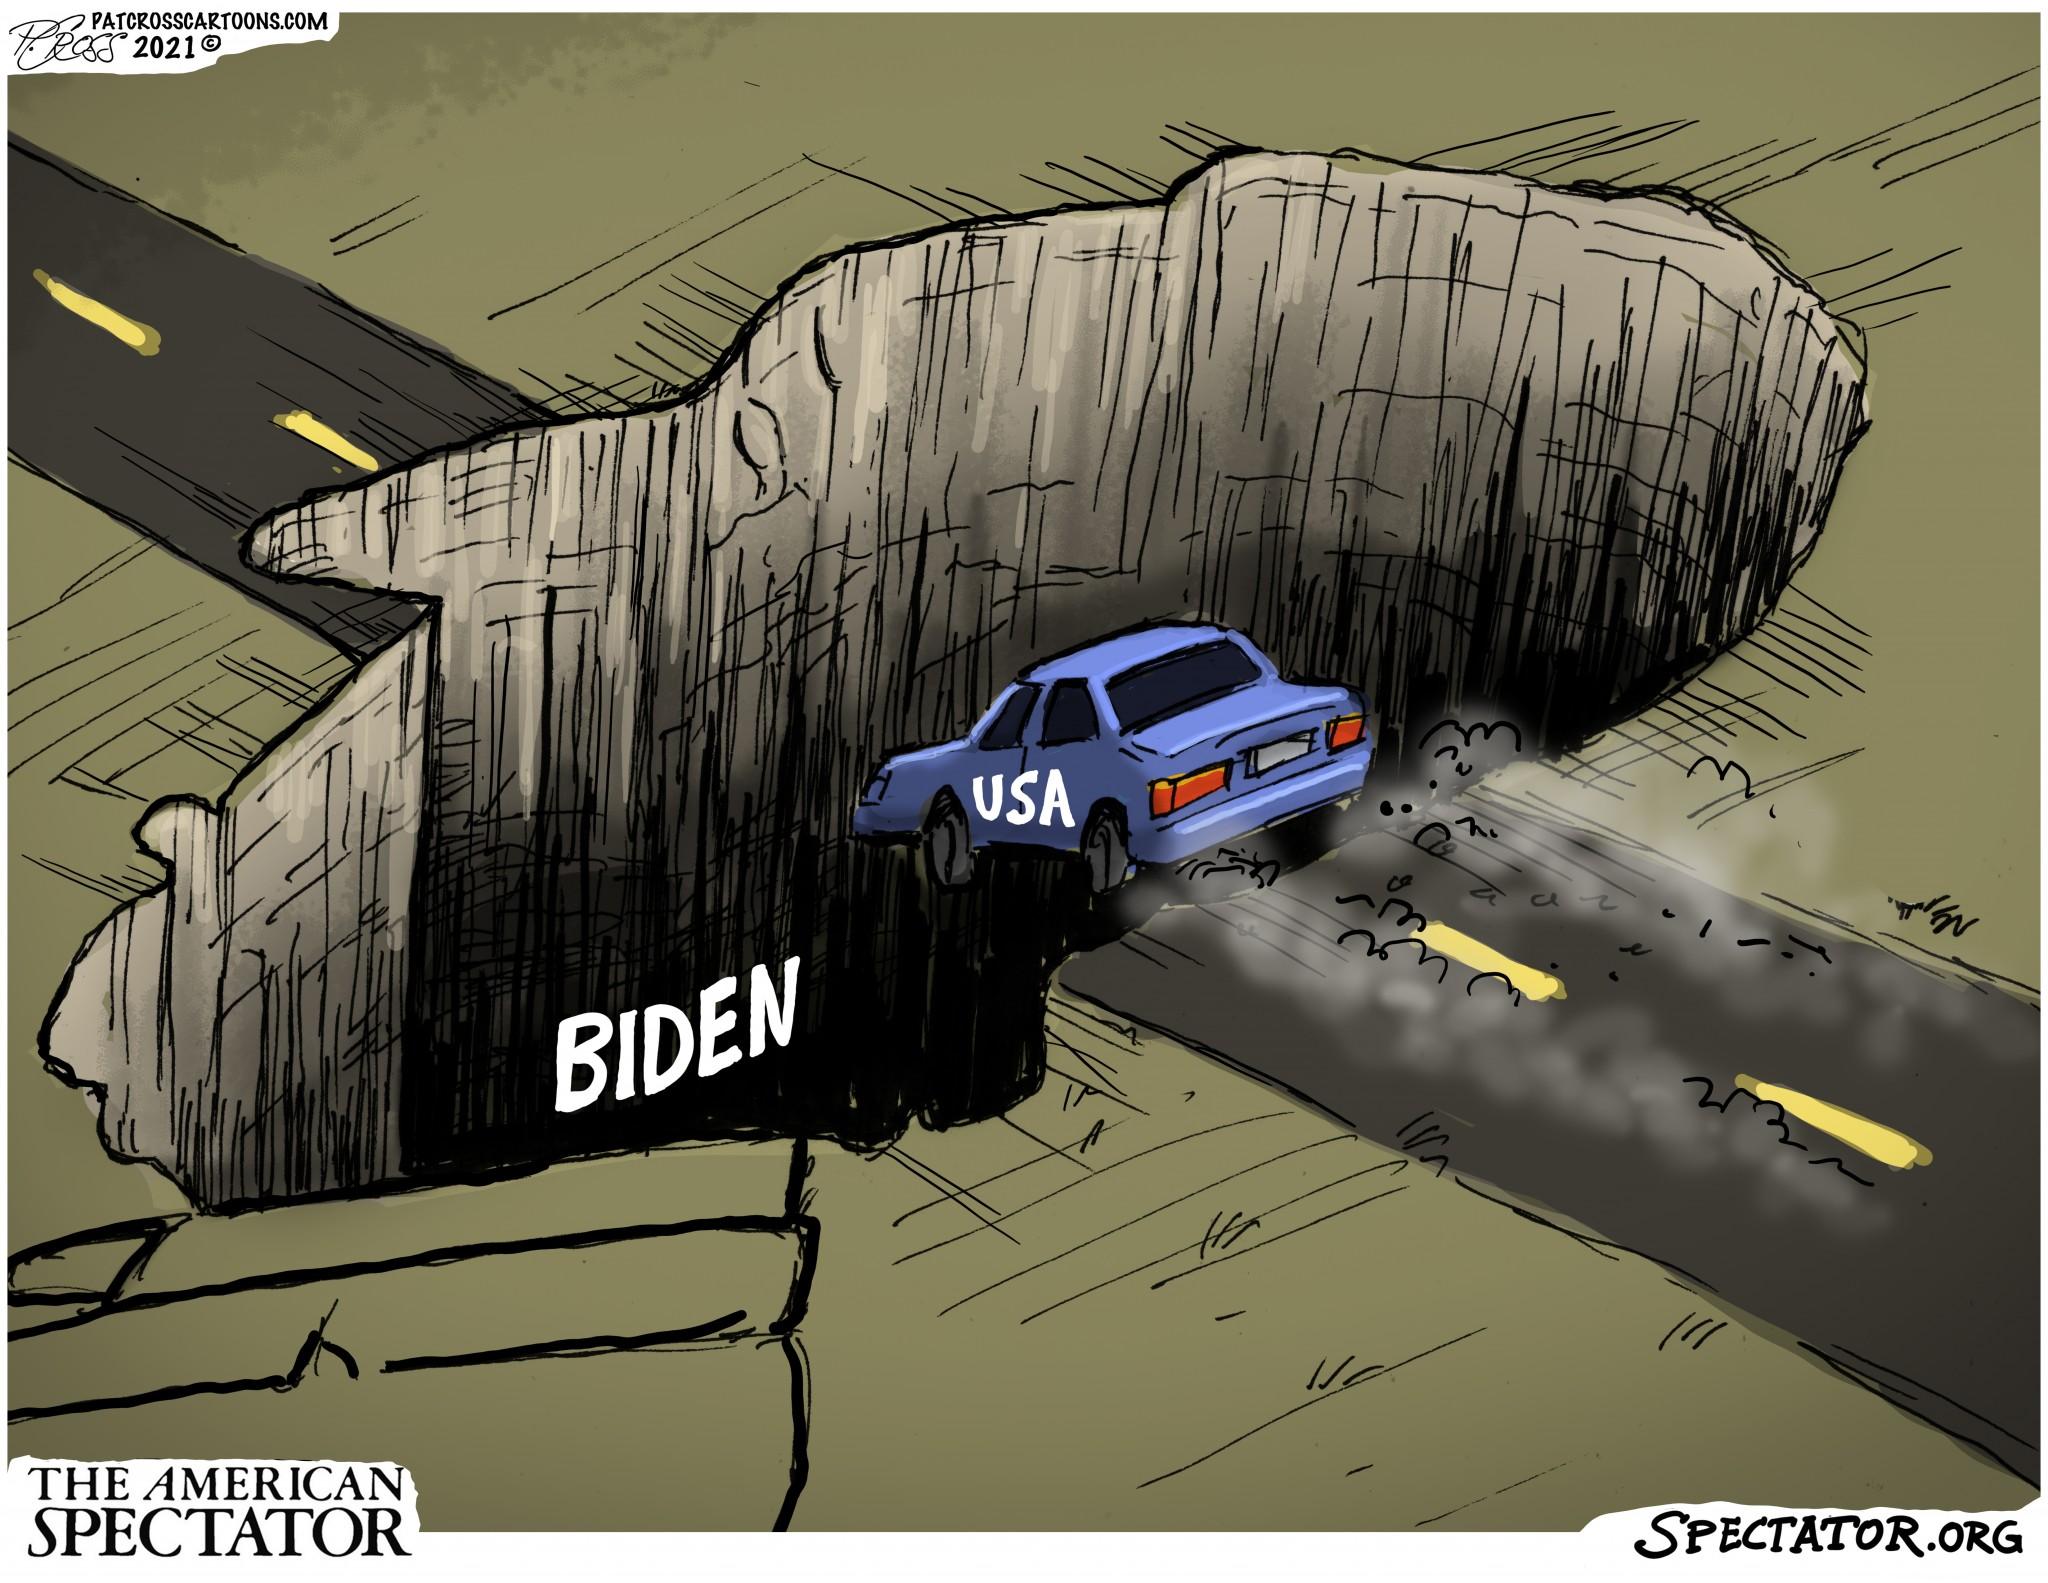 """Biden Pit,"" editorial cartoon by Patrick CrossforThe American Spectator, August 23, 2021."